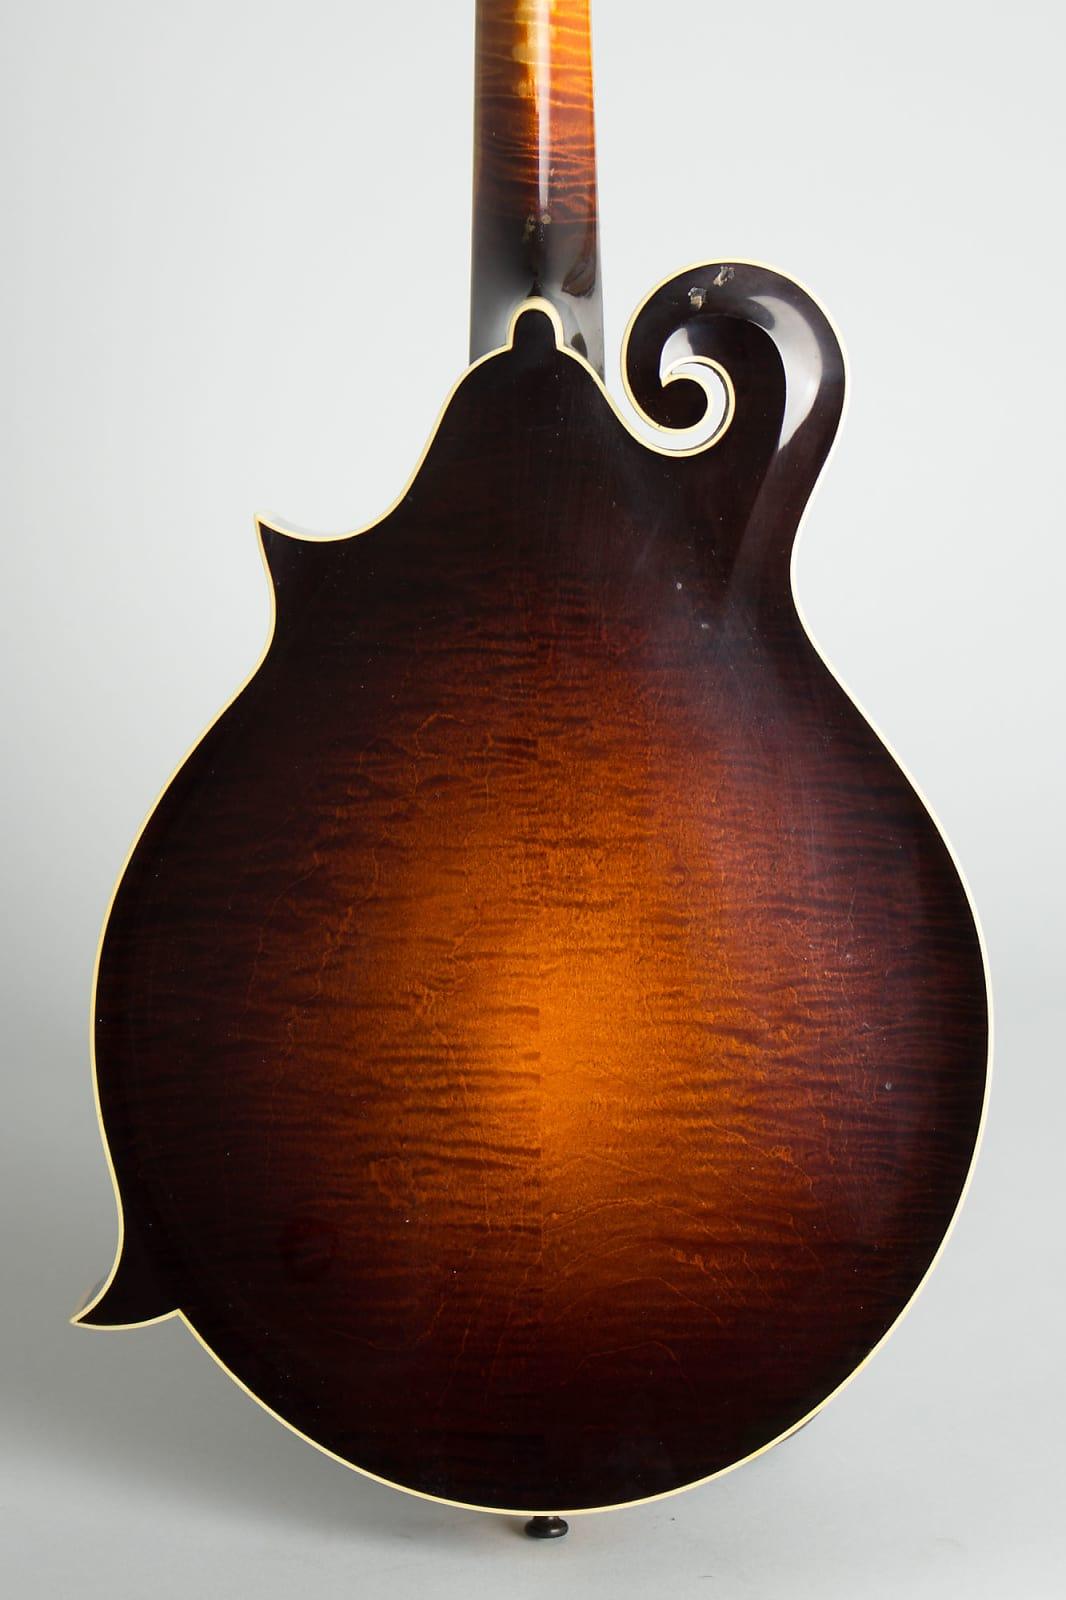 Collings  MF5-R Carved Top Mandolin (2002), ser. #43, original black tolex hard shell case.